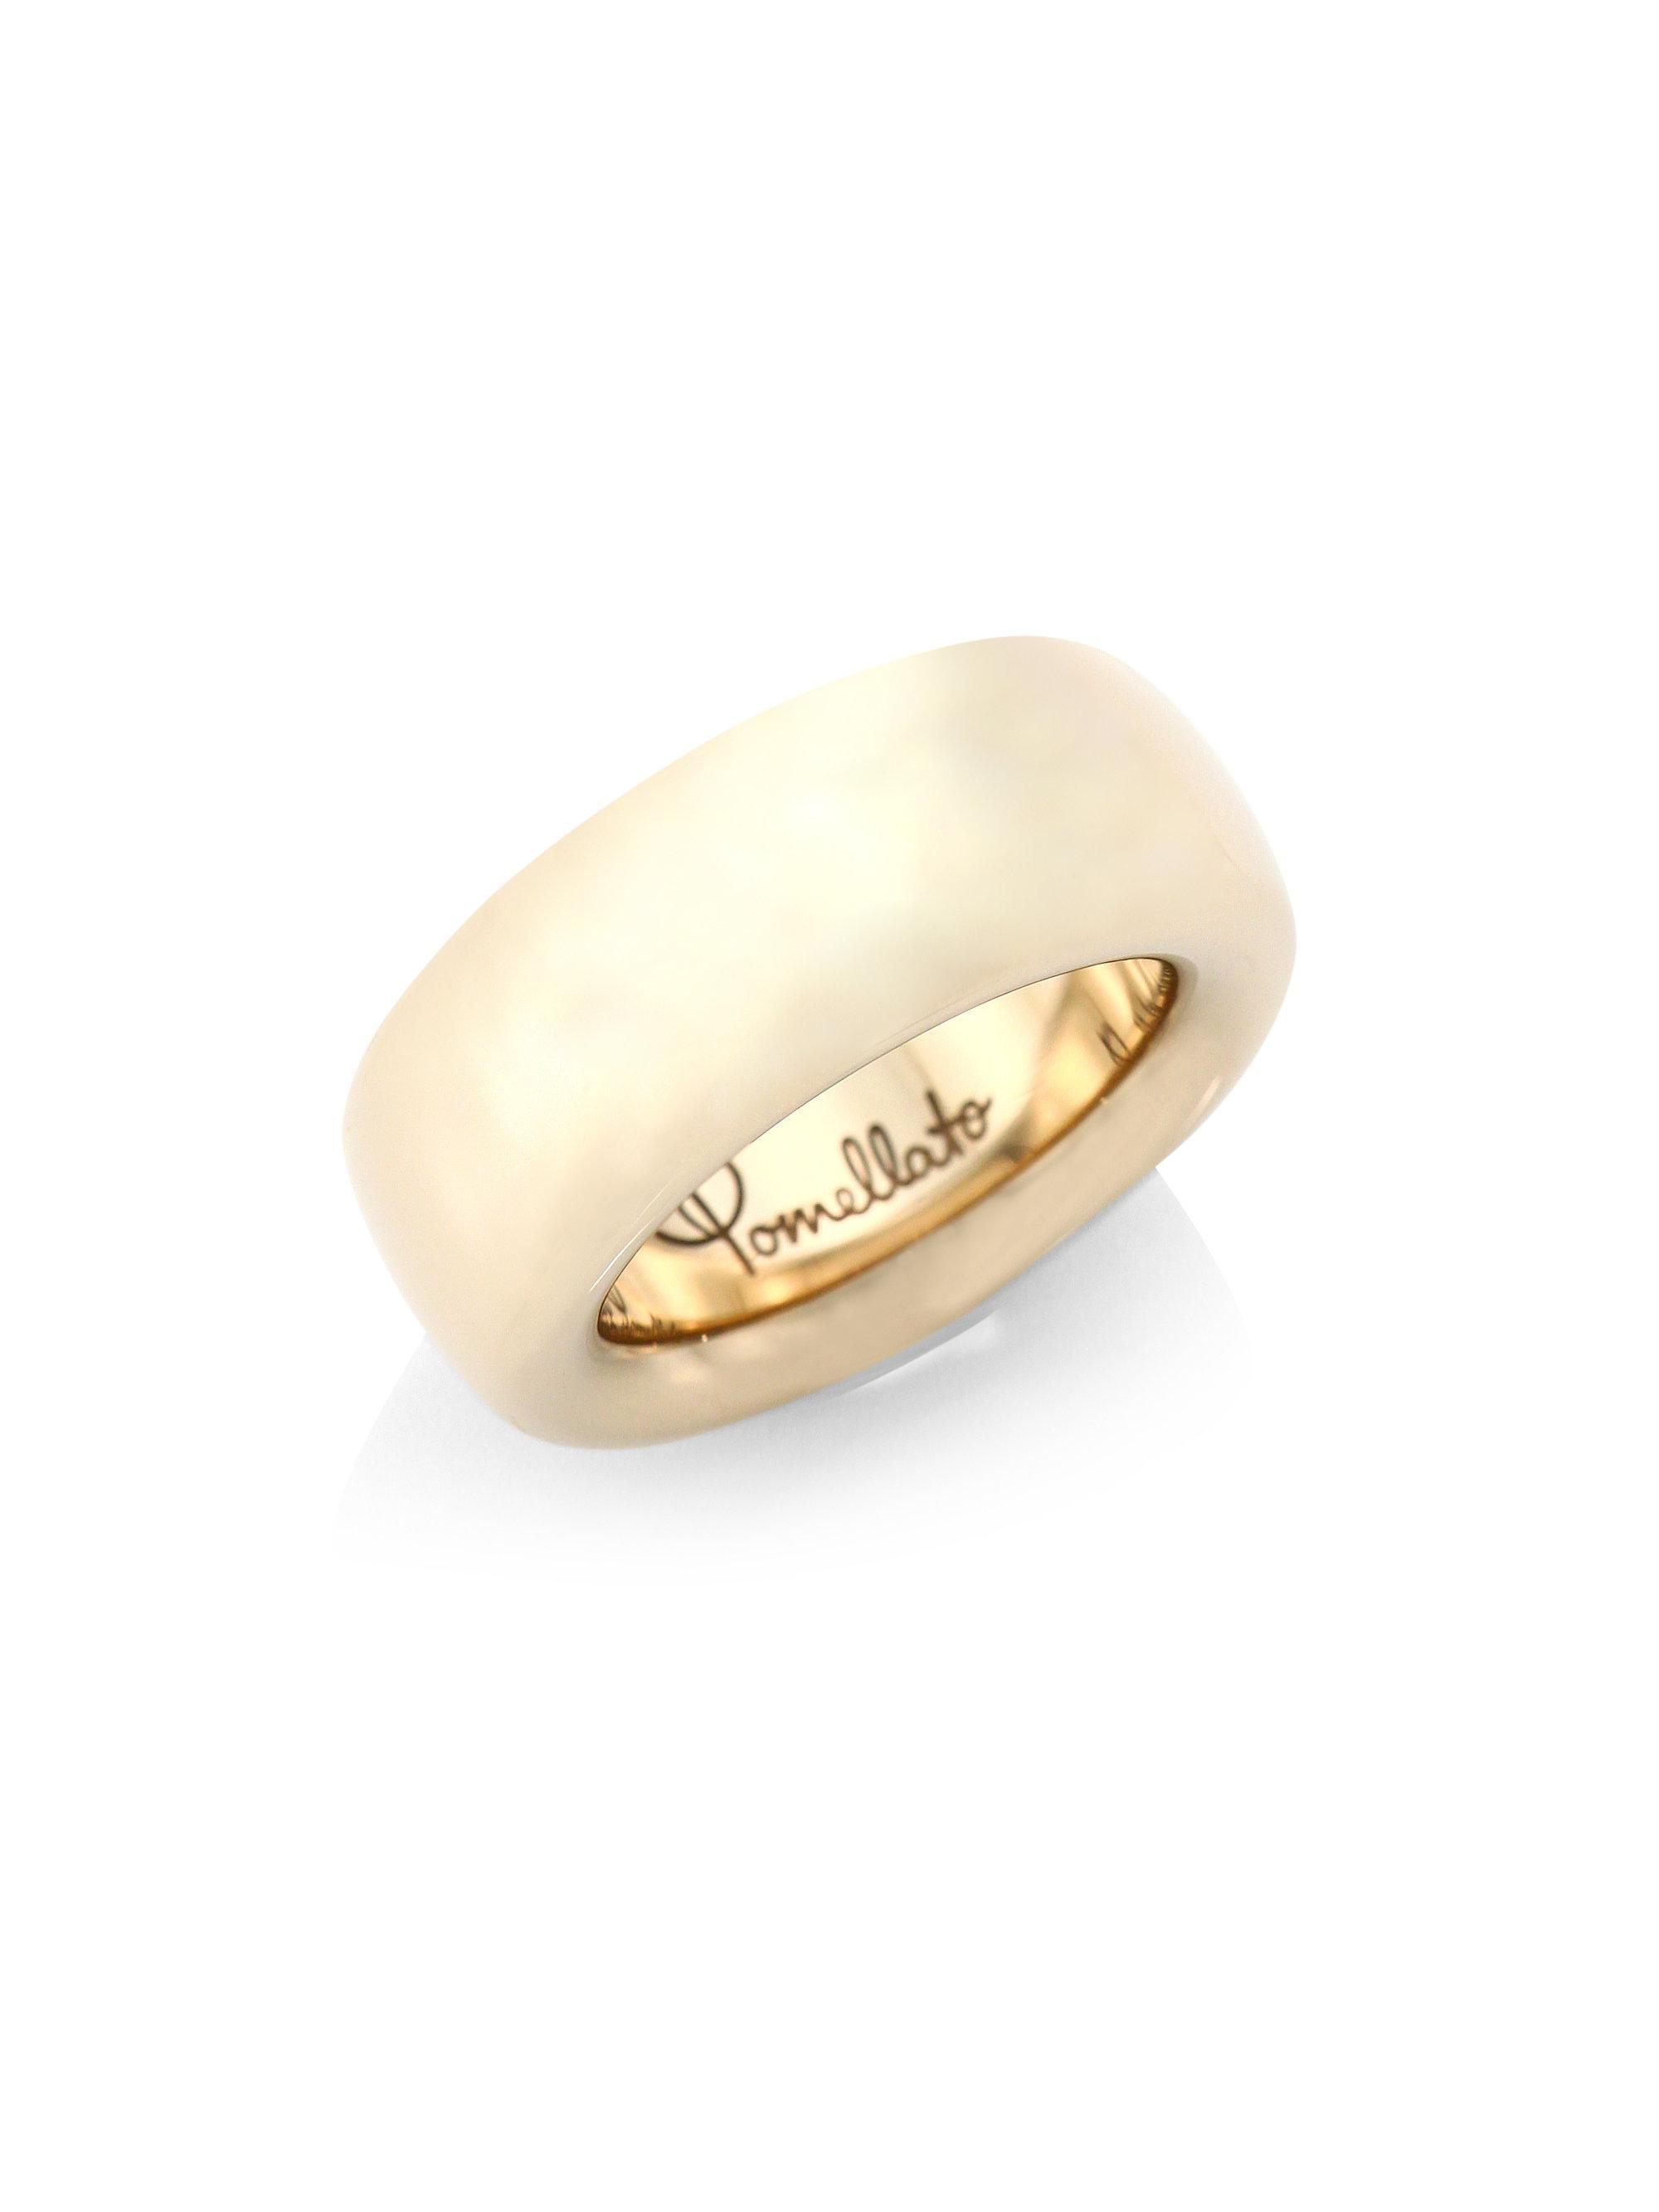 POMELLATO Iconica 18-karat Rose Gold Ring RtSmc